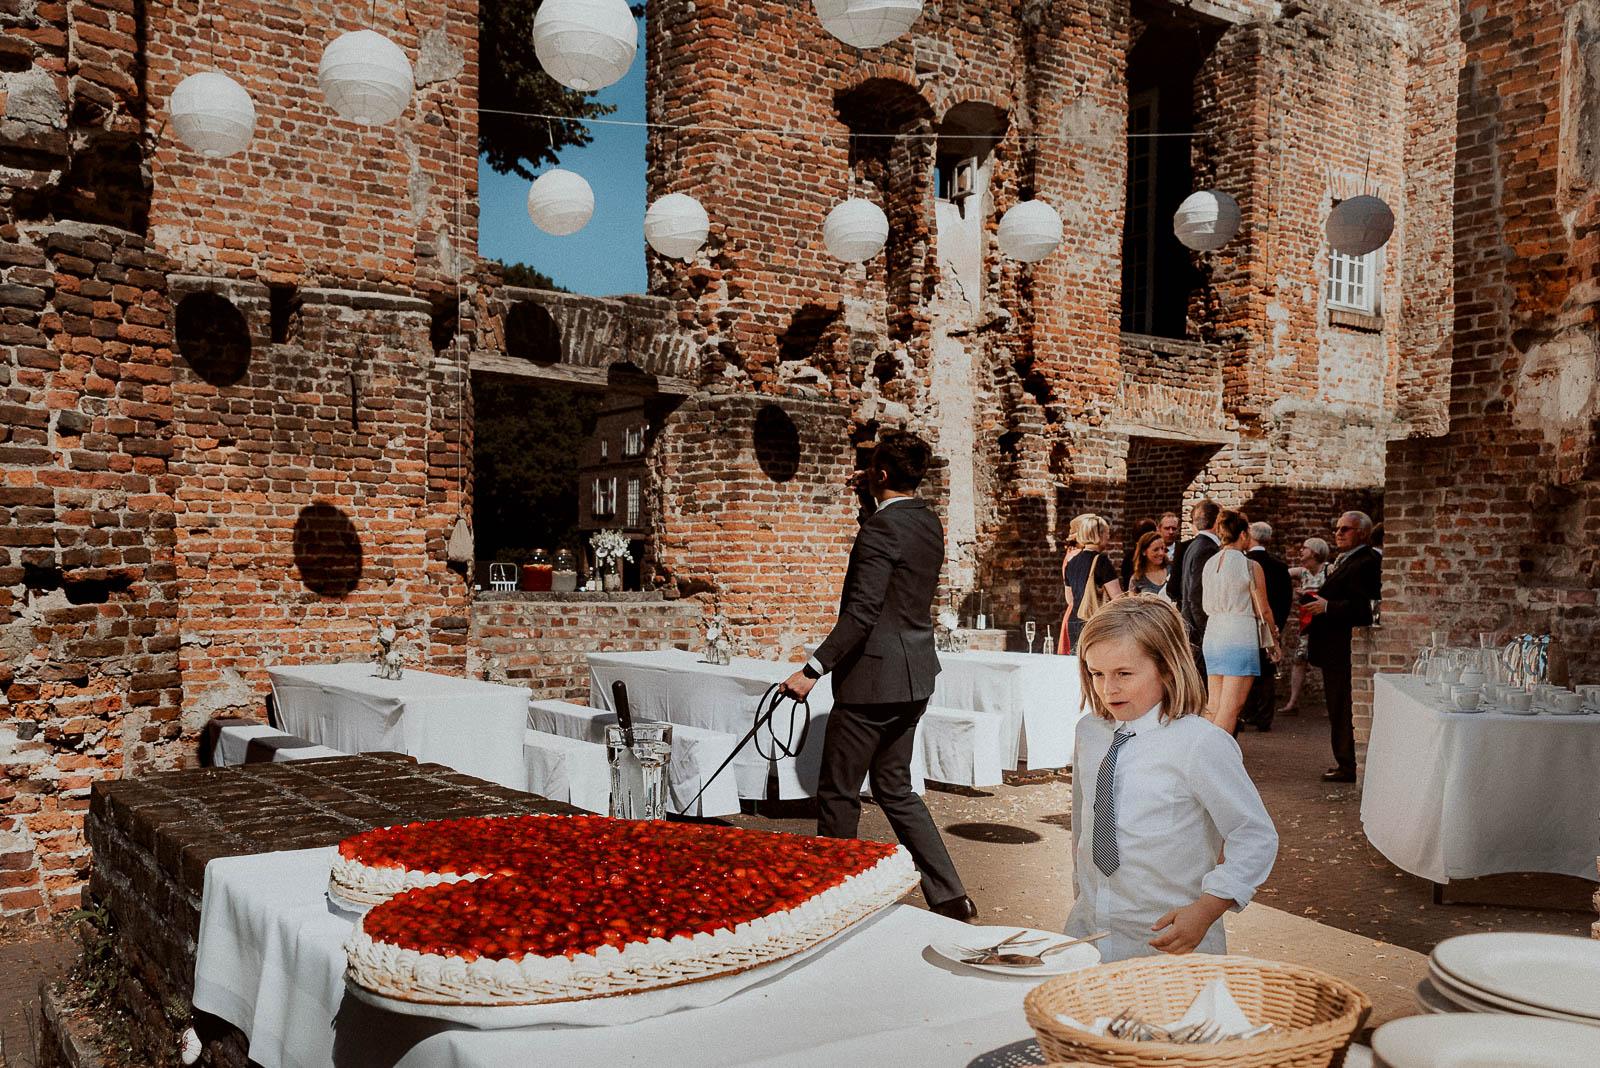 Schloss Hertefeld Ruine Sommer Torte in Herzform aus Erdberen